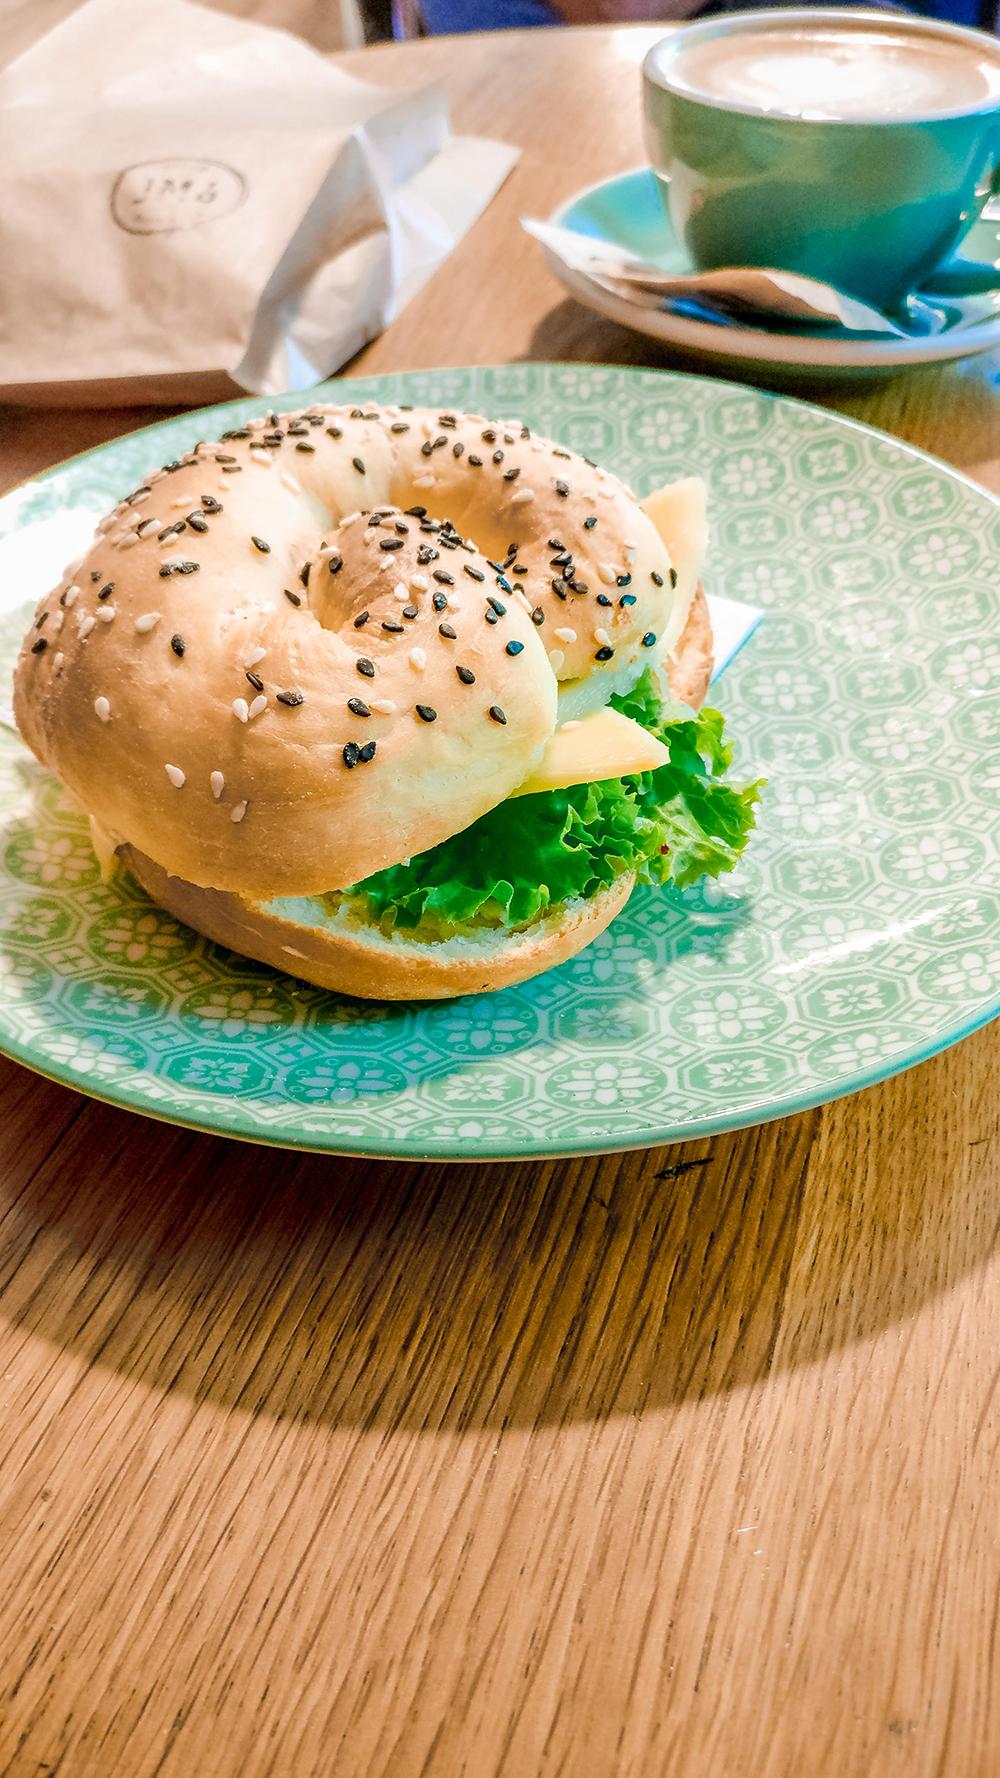 Tomato pesto sandwich at JM6 Bakery & Café - Budapest's best breakfast & brunch places - Jászai Mari square and Pozsonyi street | Aliz's Wonderland